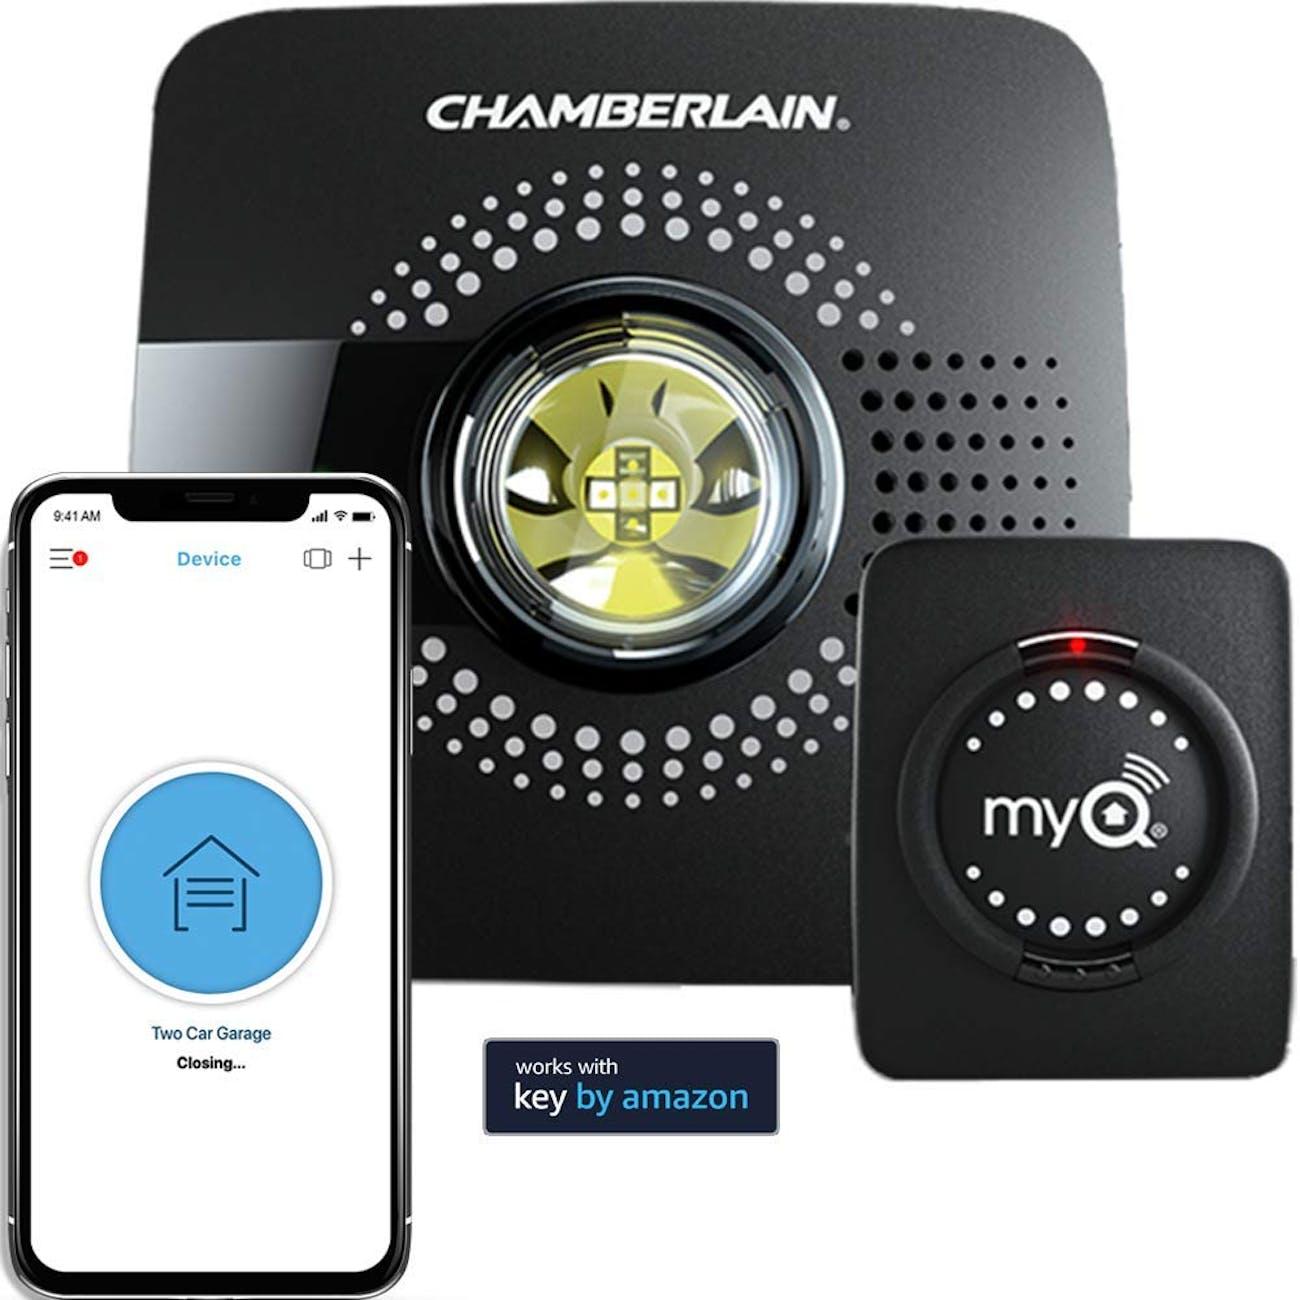 MyQ Smart Garage Door Opener Chamberlain MYQ-G0301 - Wireless & Wi-Fi enabled Garage Hub with Smartphone Control